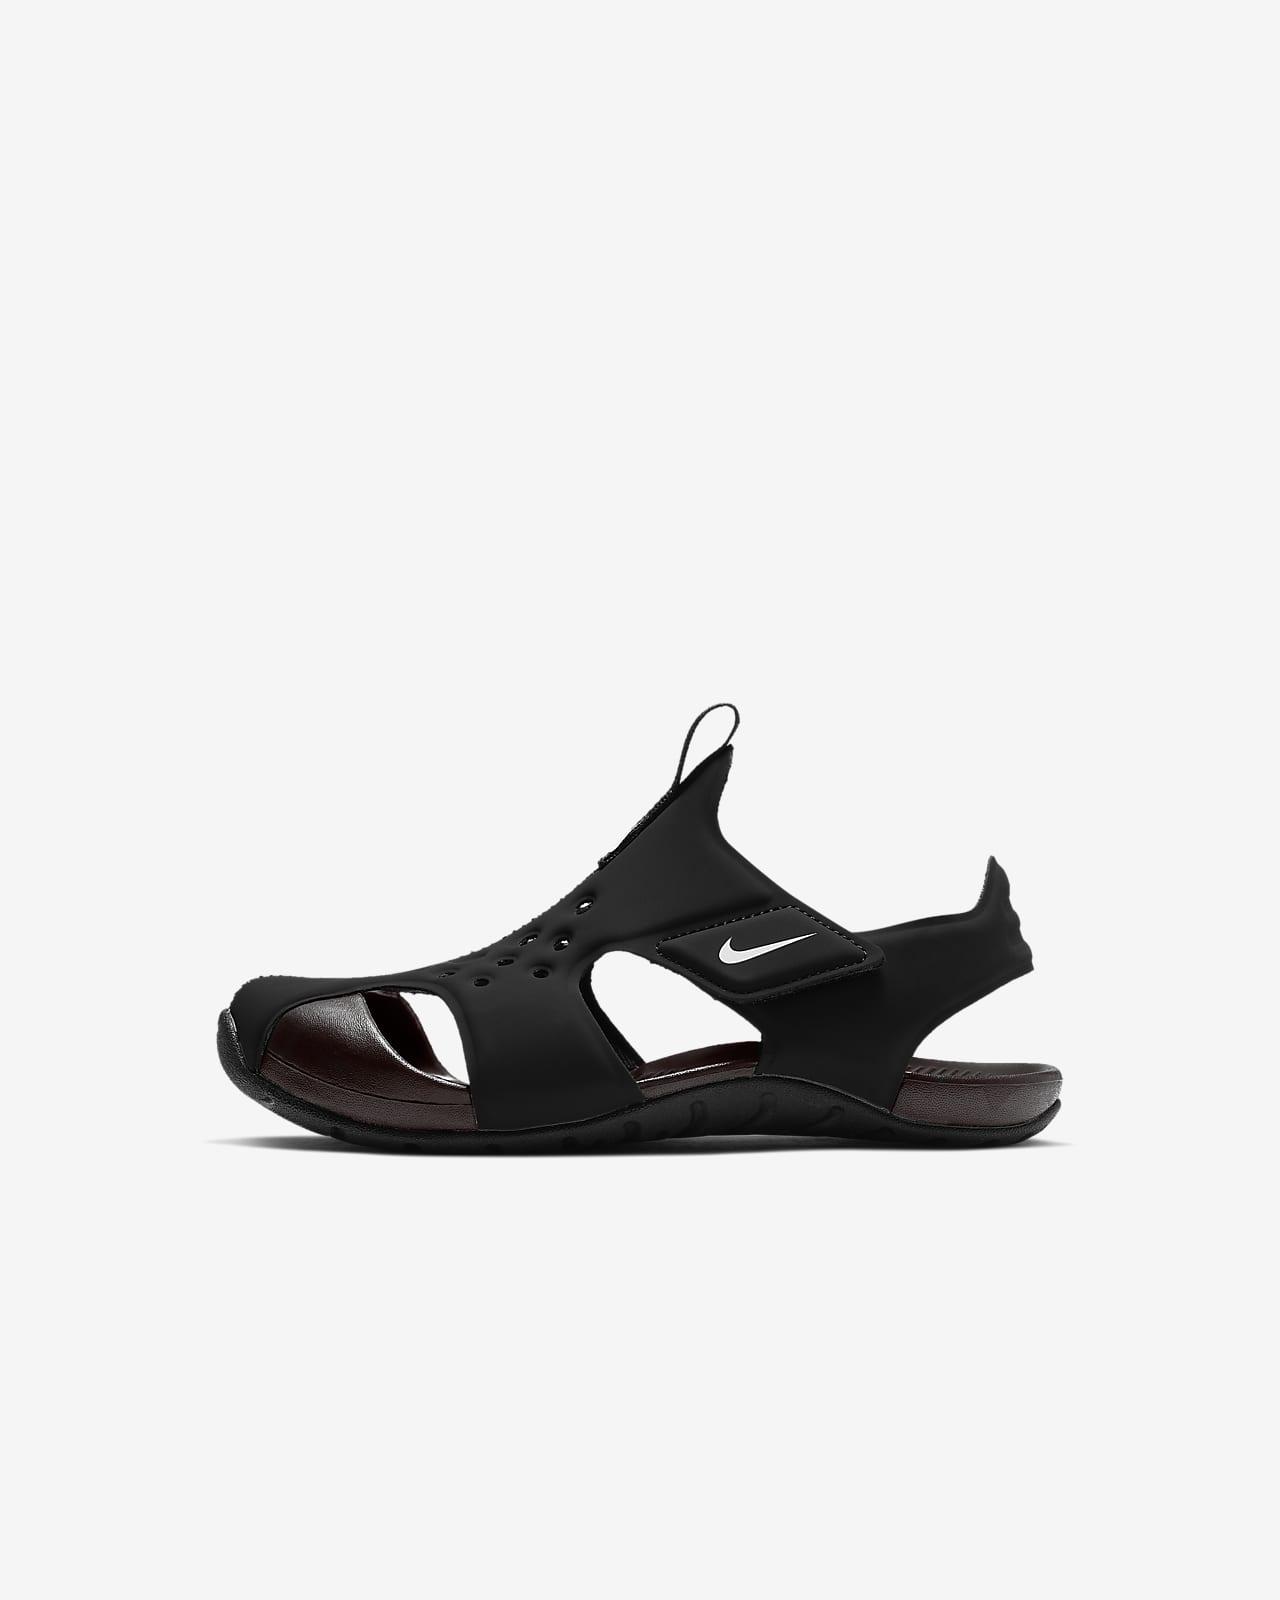 Nike Sunray Protect 2 Younger Kids' Sandal. Nike ID